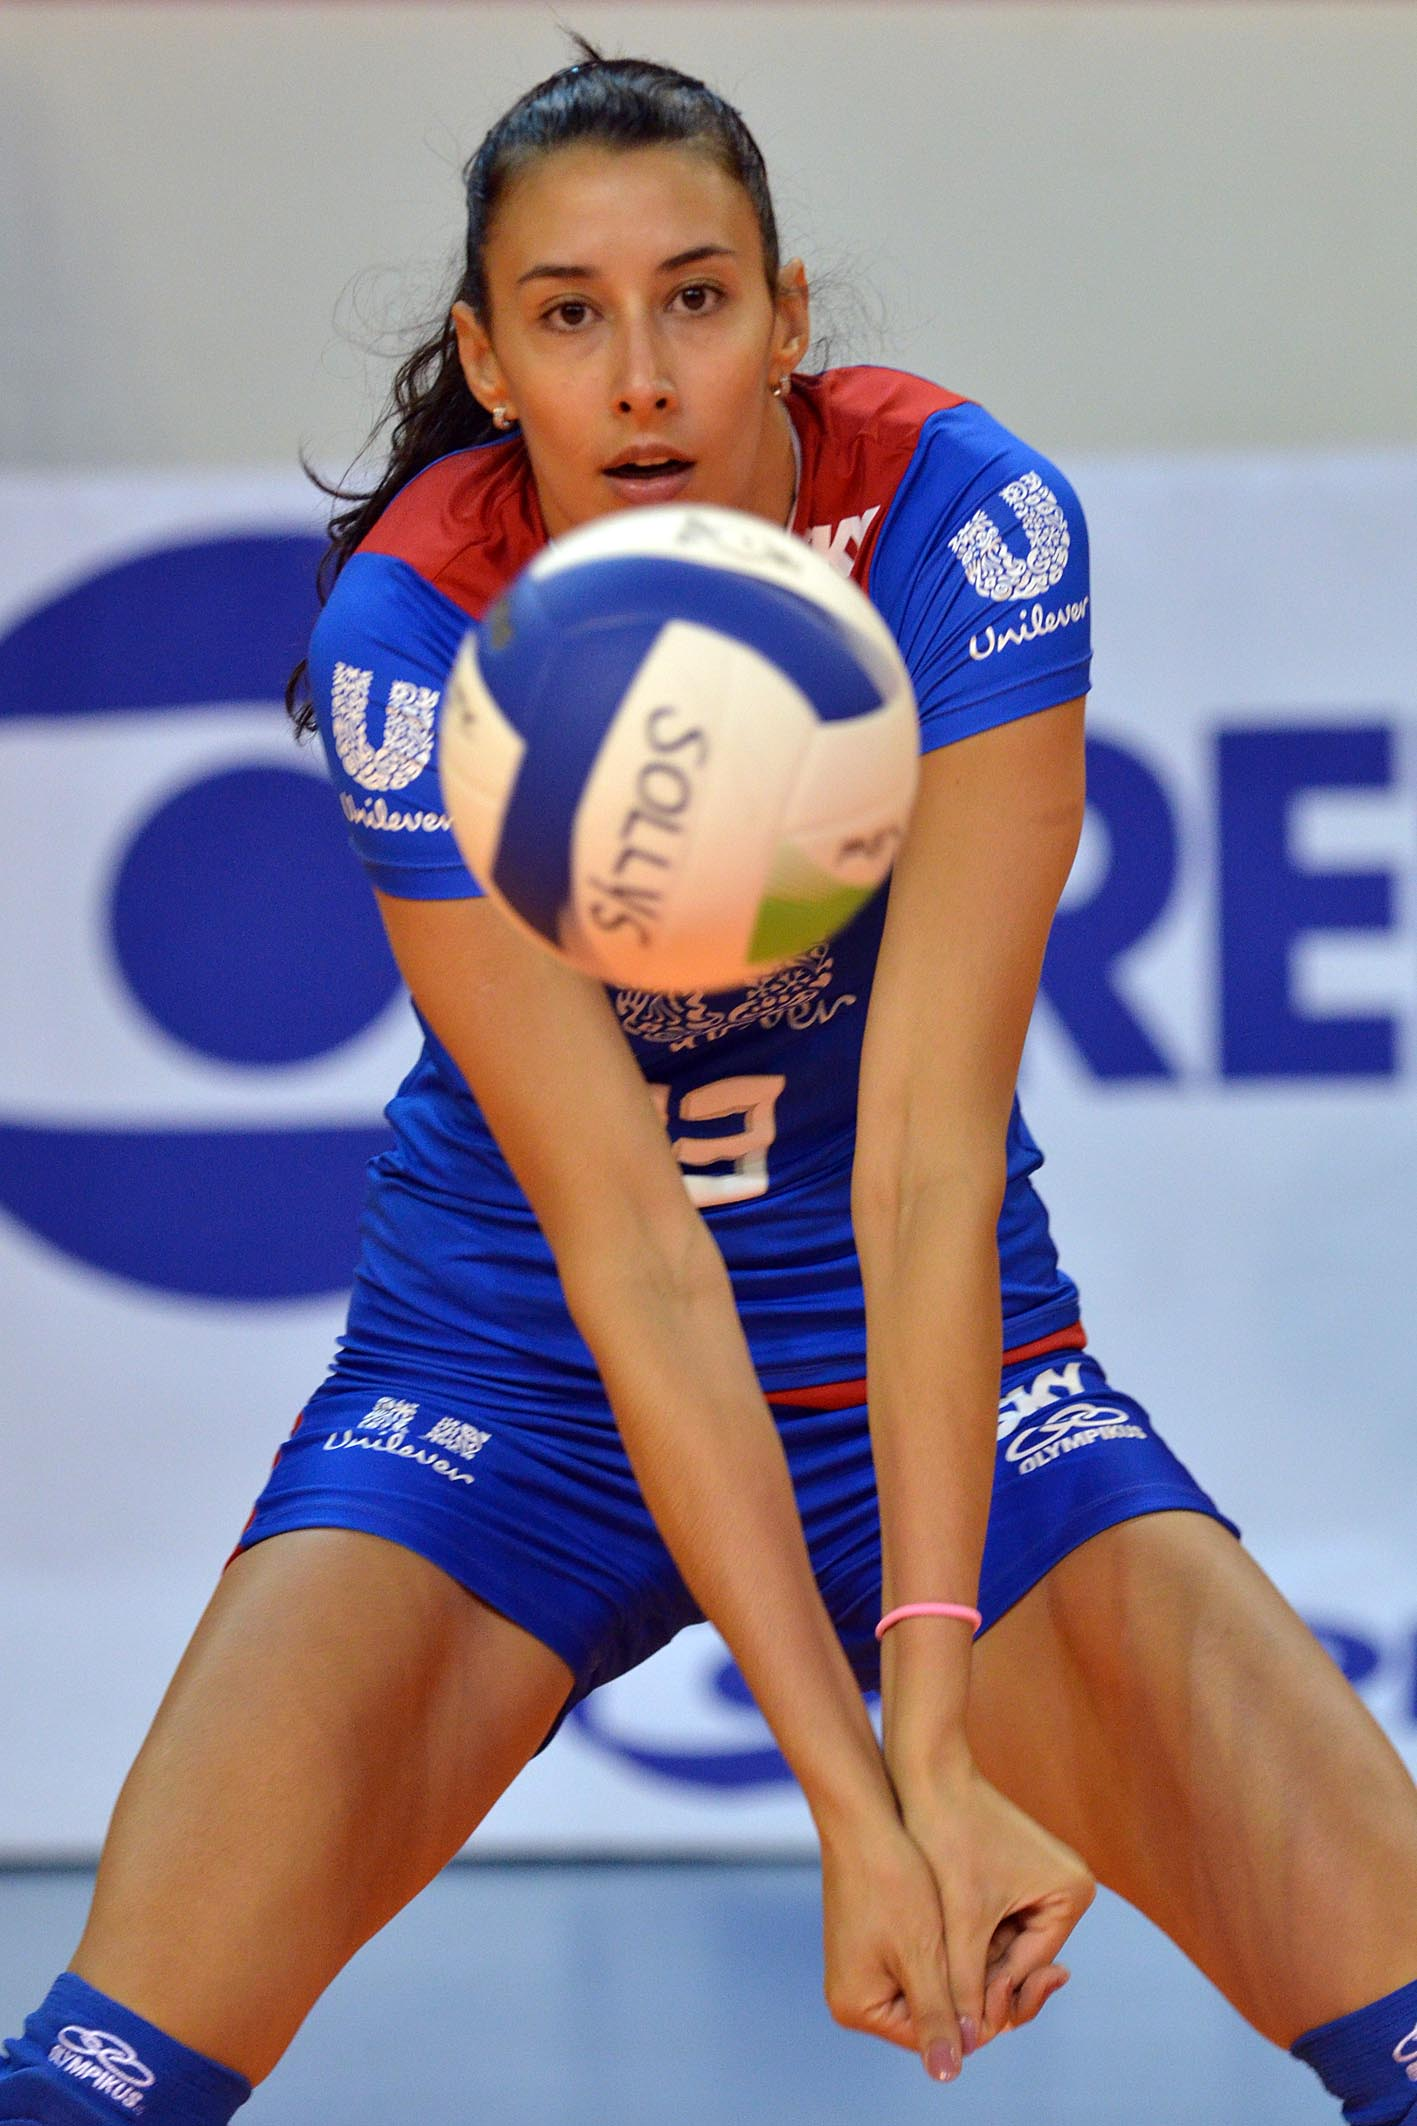 Sheilla Tavares de Castro, Brezilyalı voleybolcu tarihte bugün